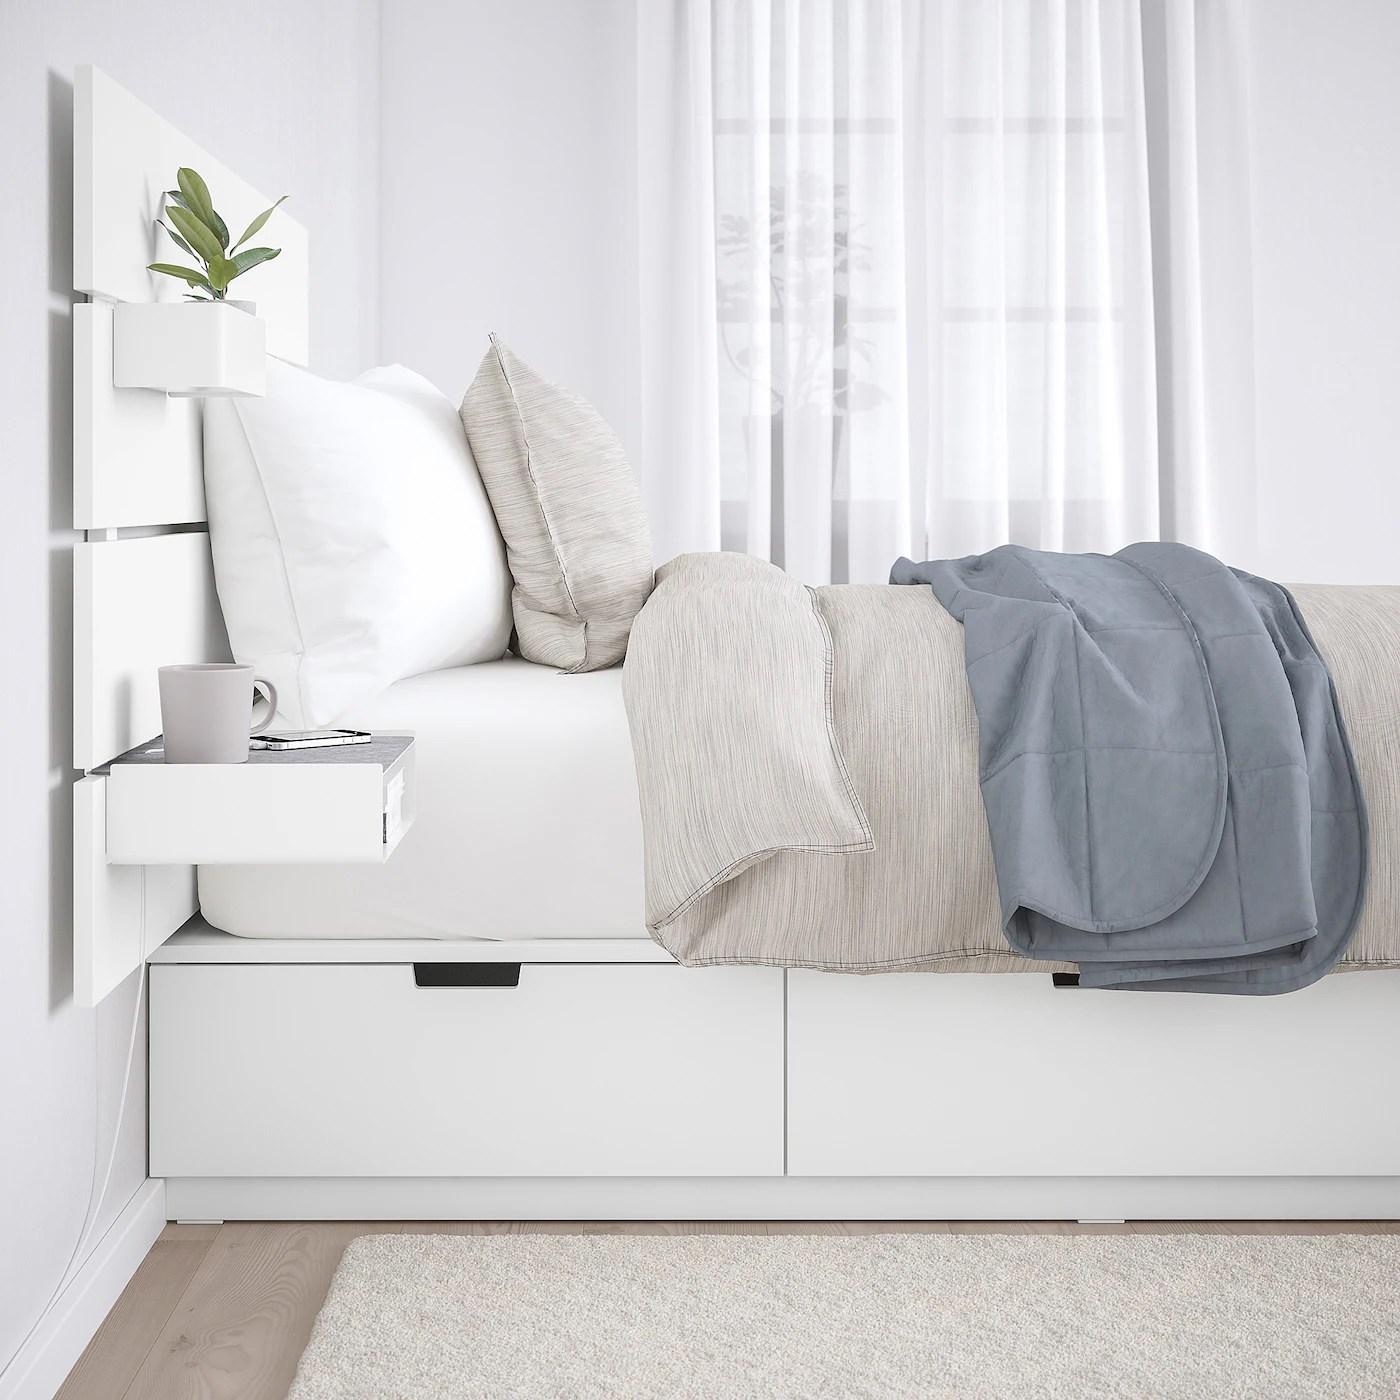 Ikea Betten 90x200 Weiß   Jugendbett Selby 1 Weiß 90x200 ...